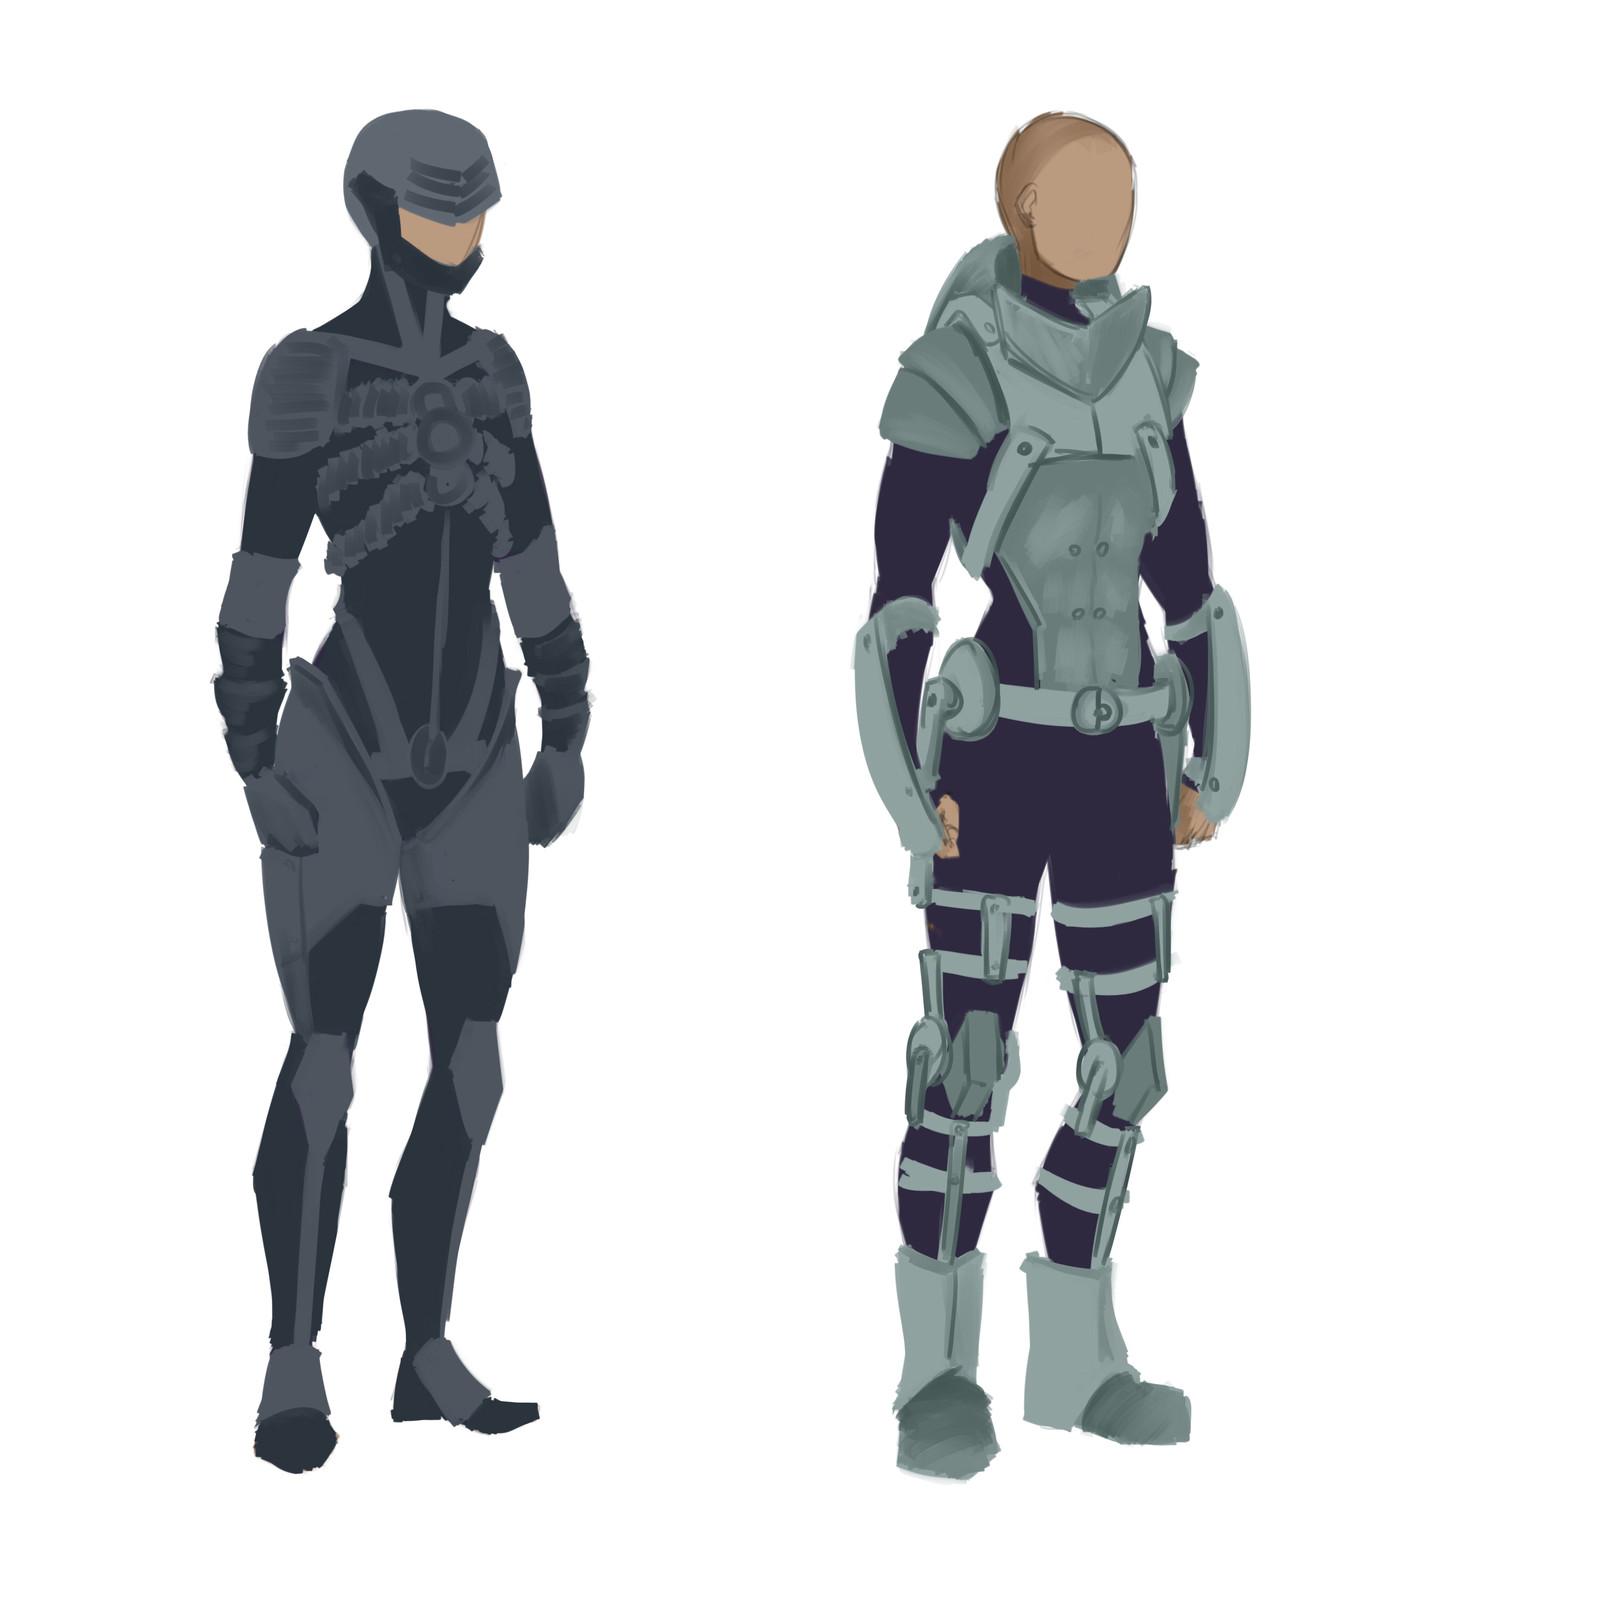 Xono - Concept Sketches Pt.1